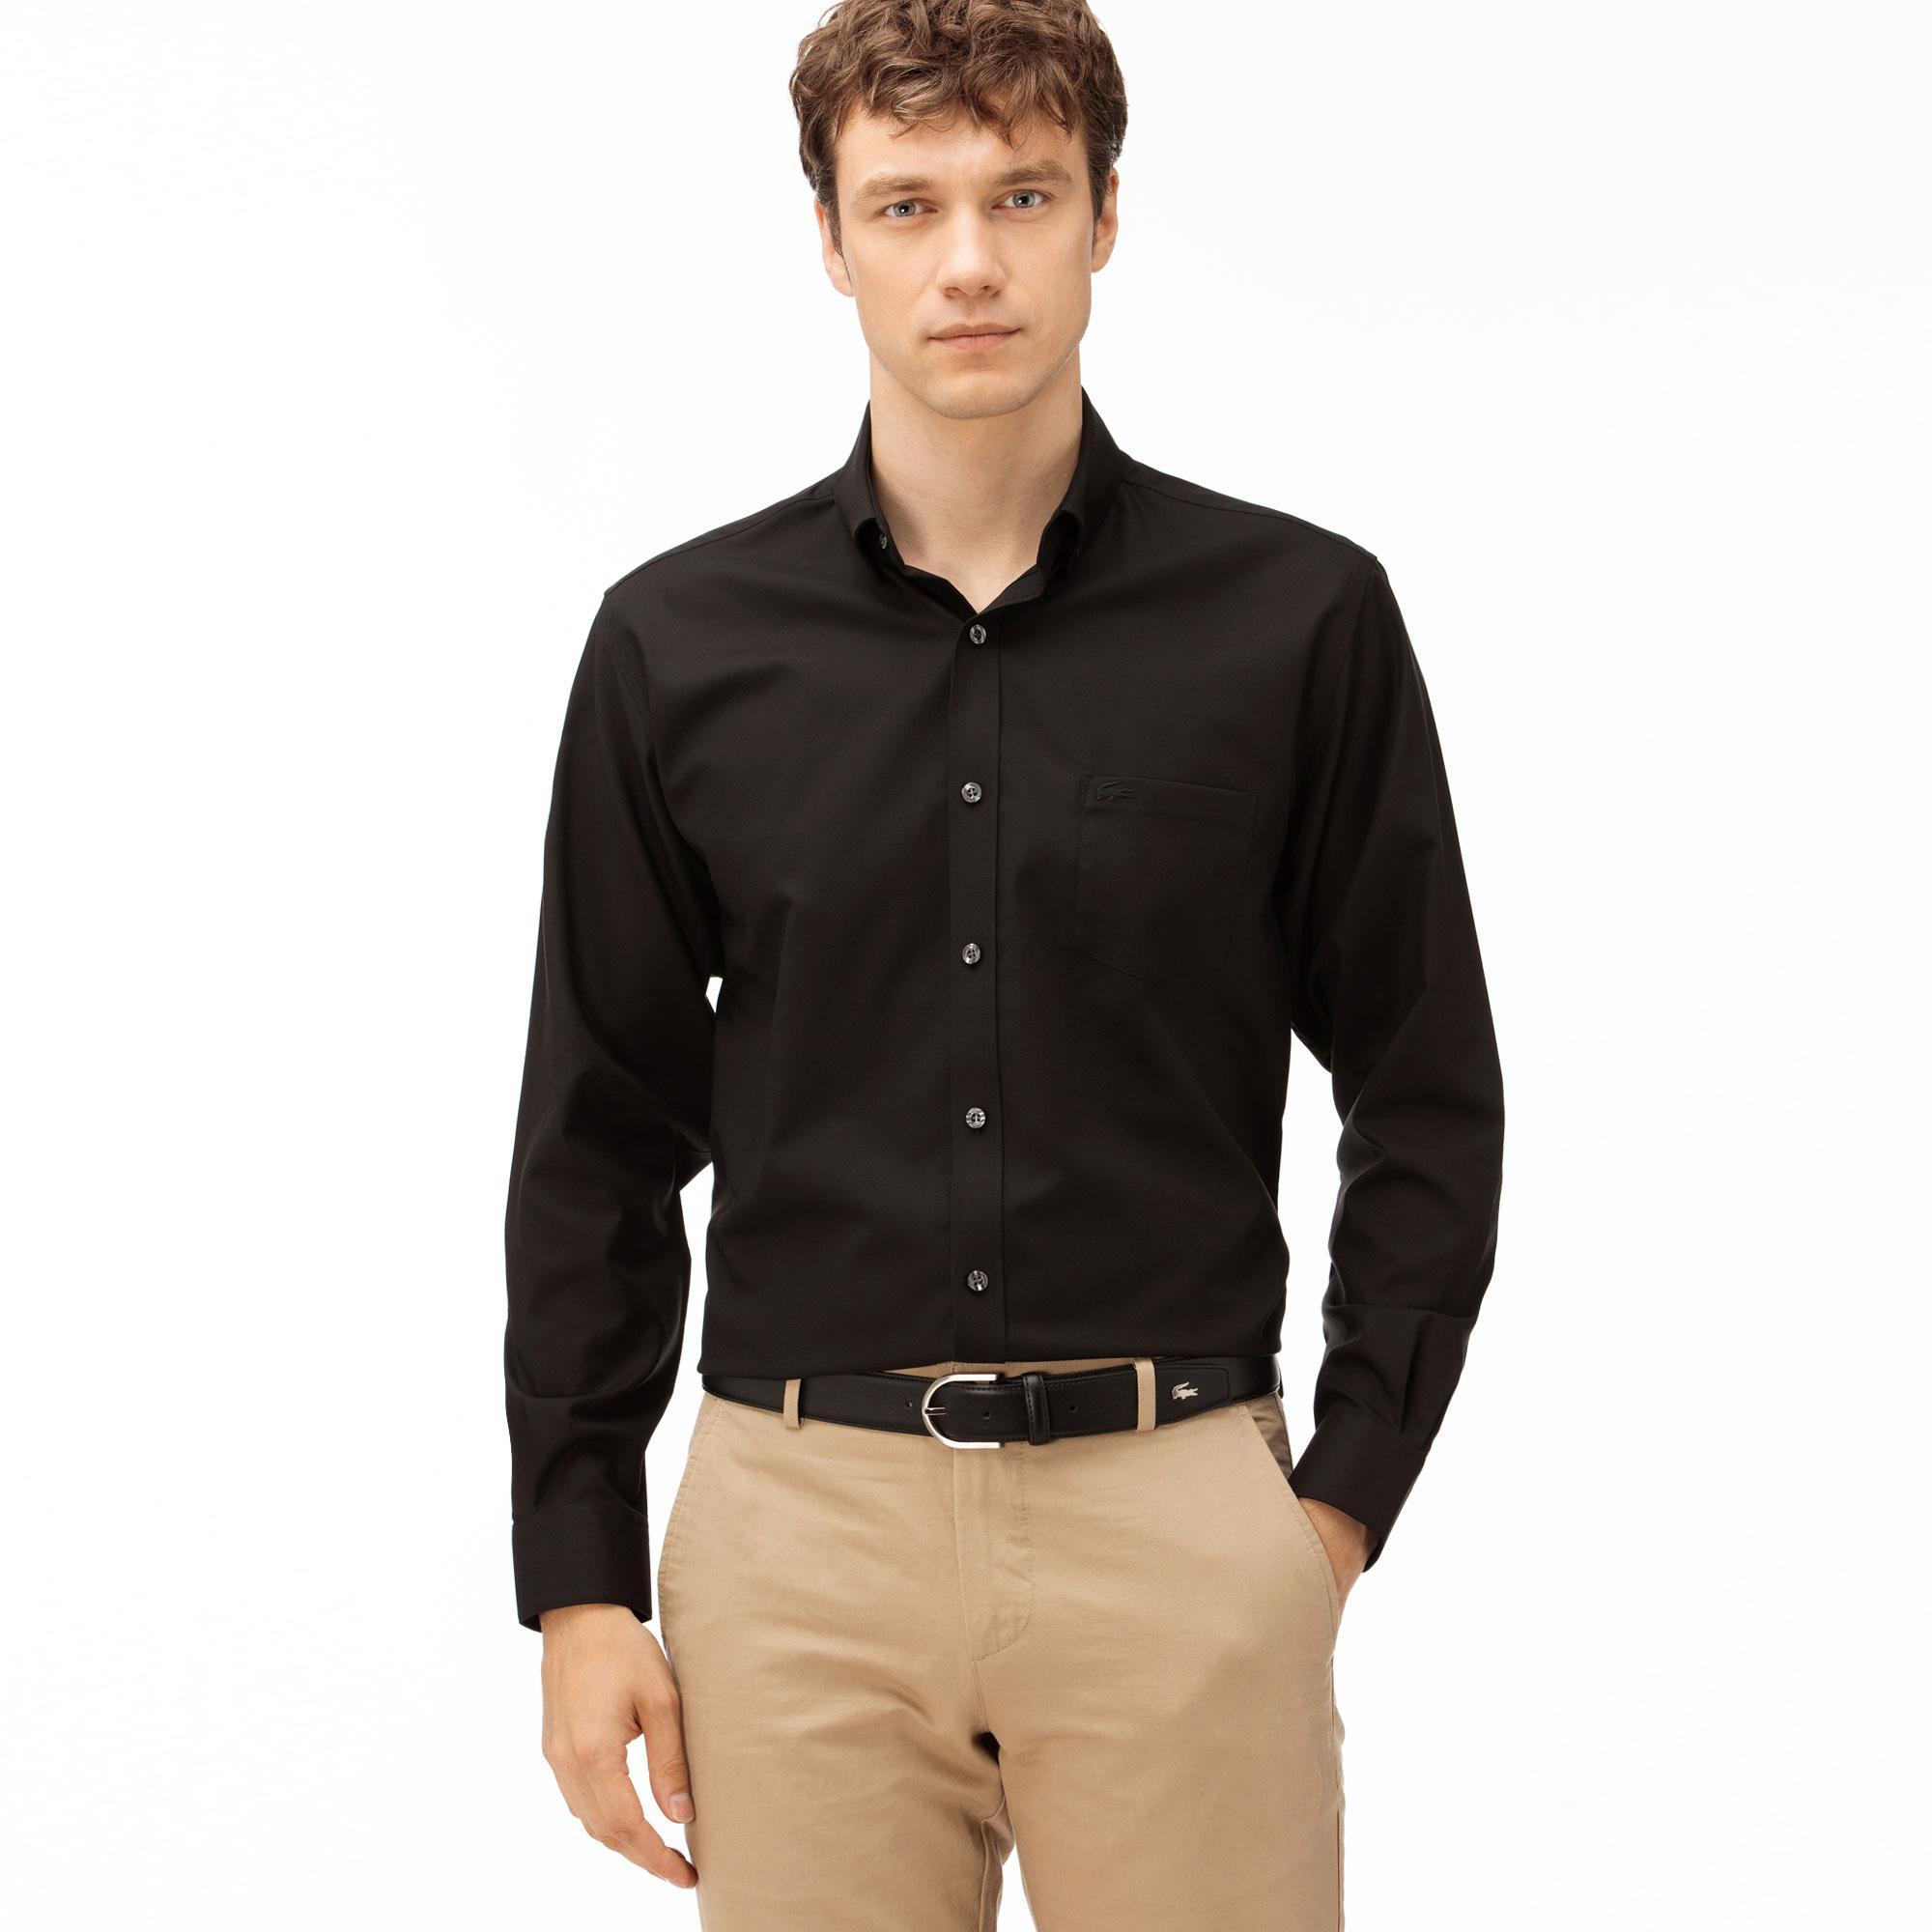 Lacoste Men's Regular Fit Long Sleeve Shirt